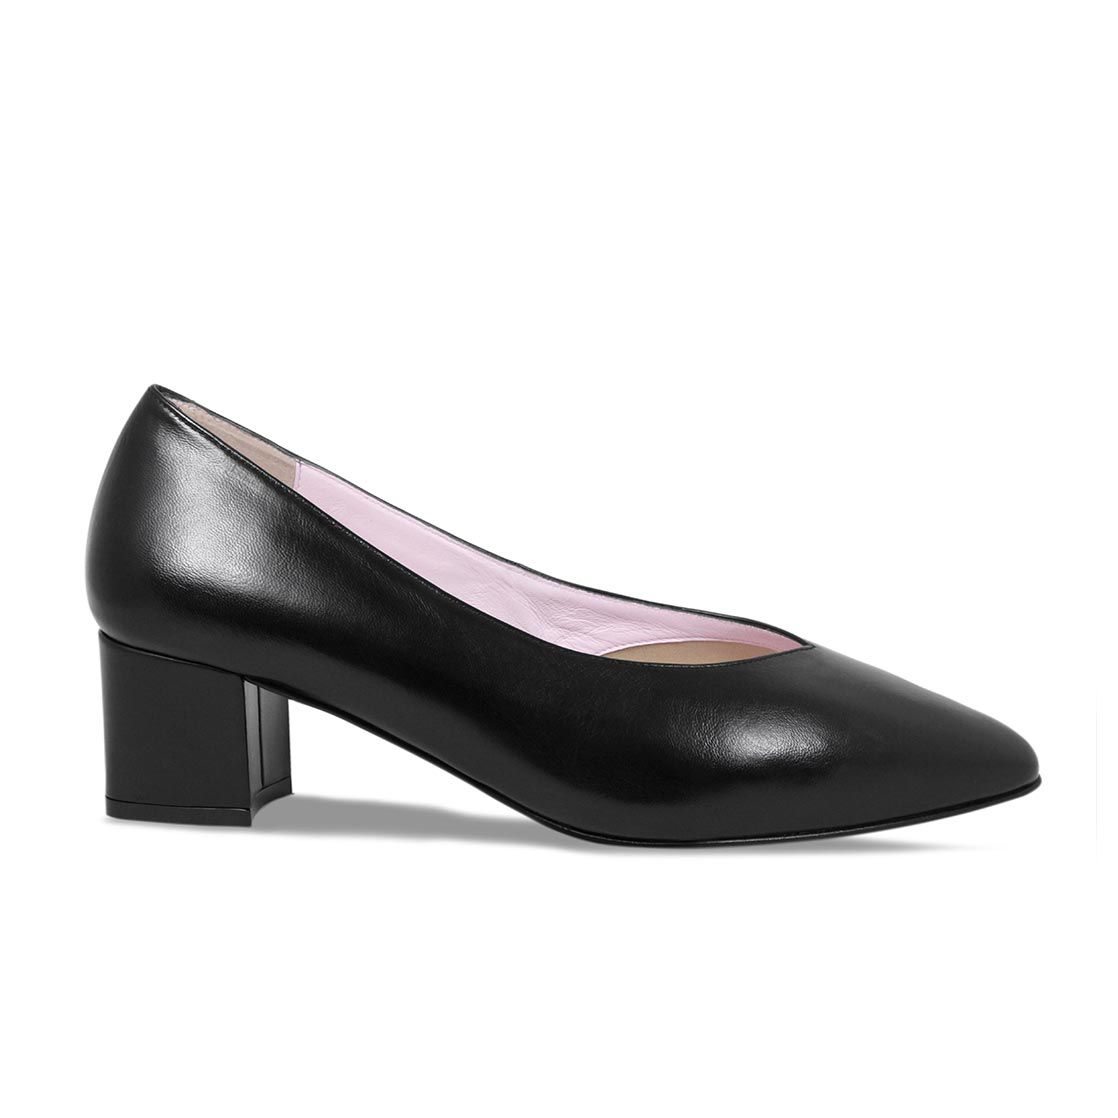 Ingrid Black Leather Heels